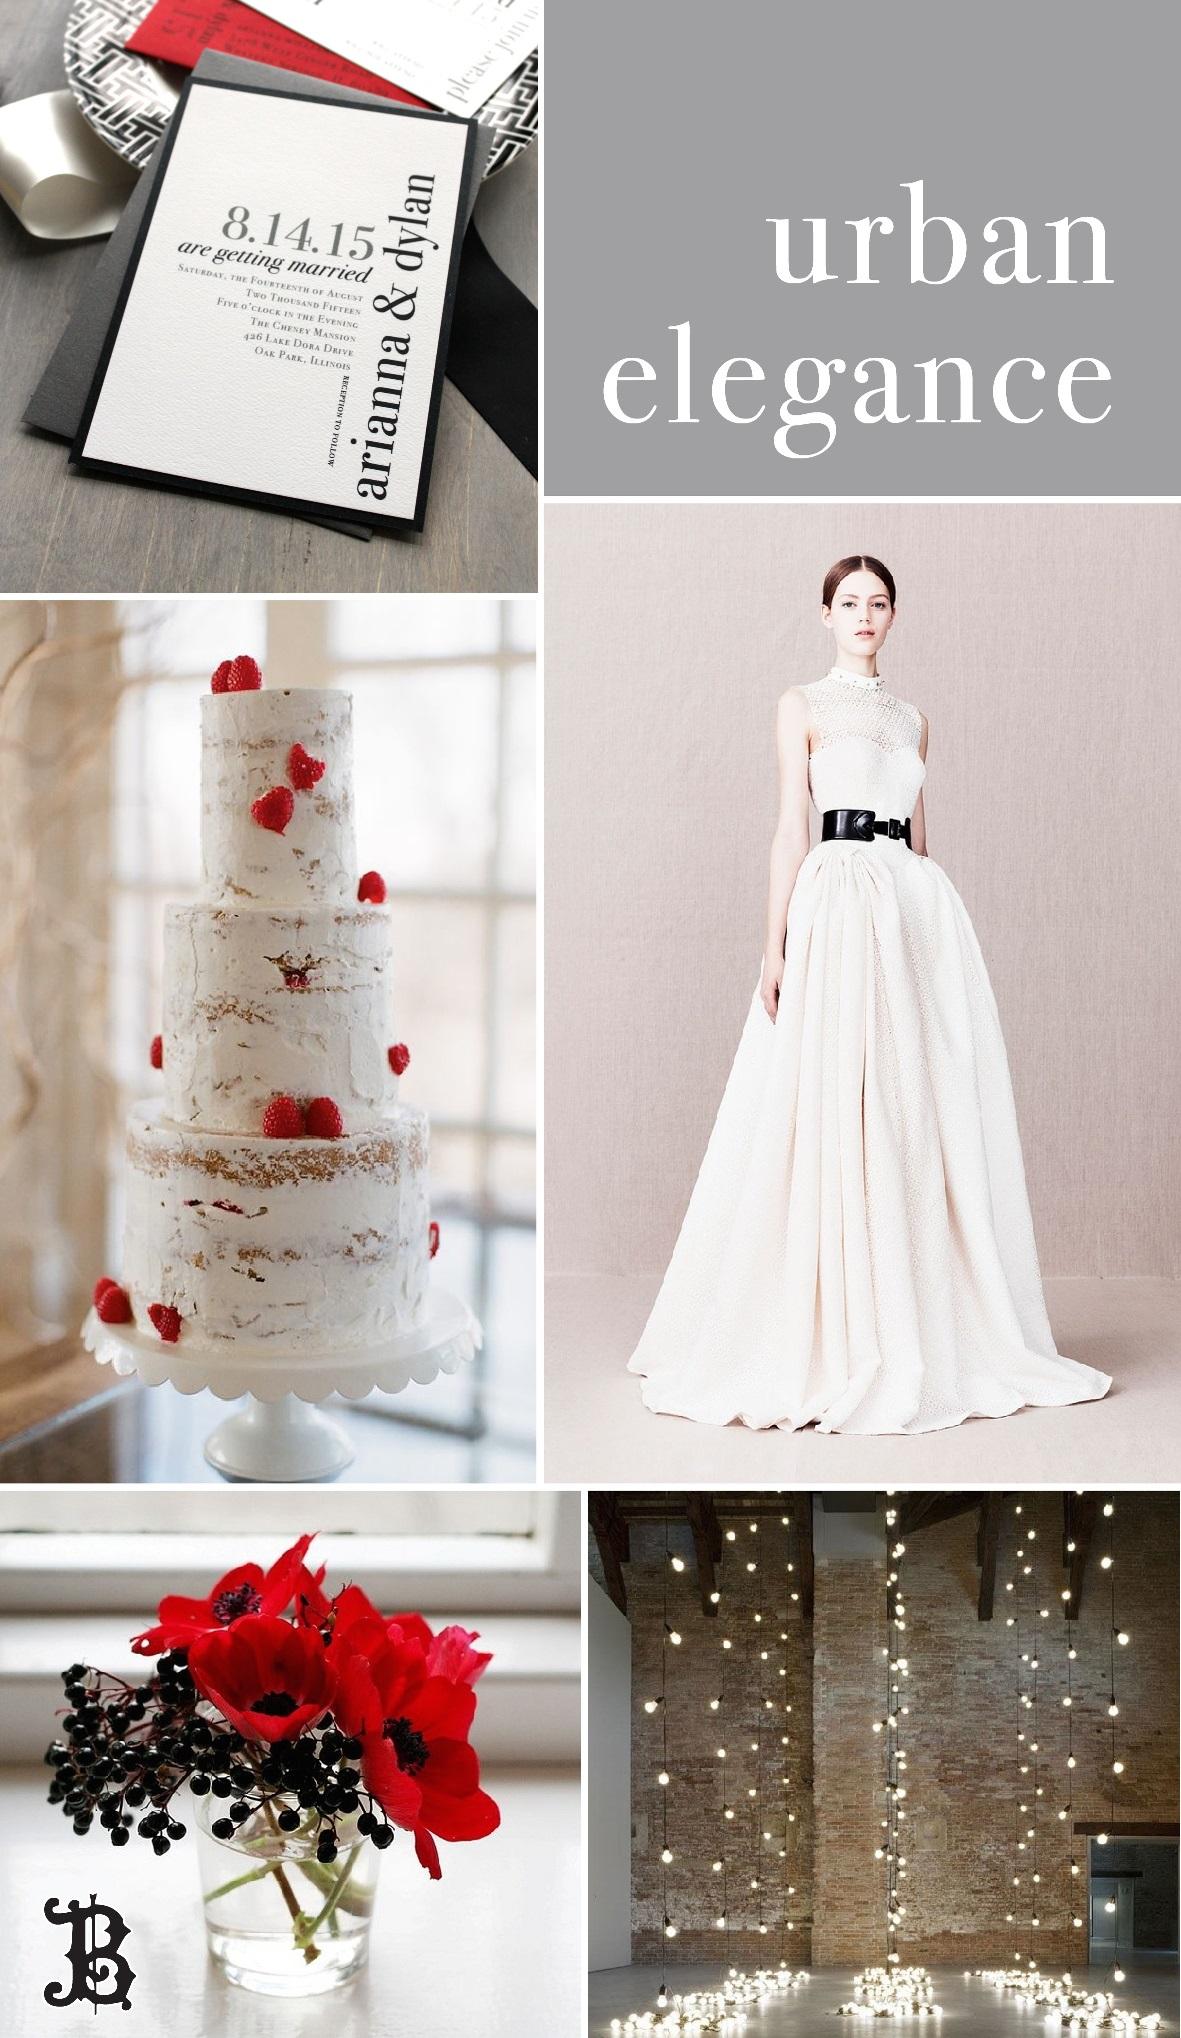 Wedding Inspiration Board - Urban Elegance by Beacon Lane